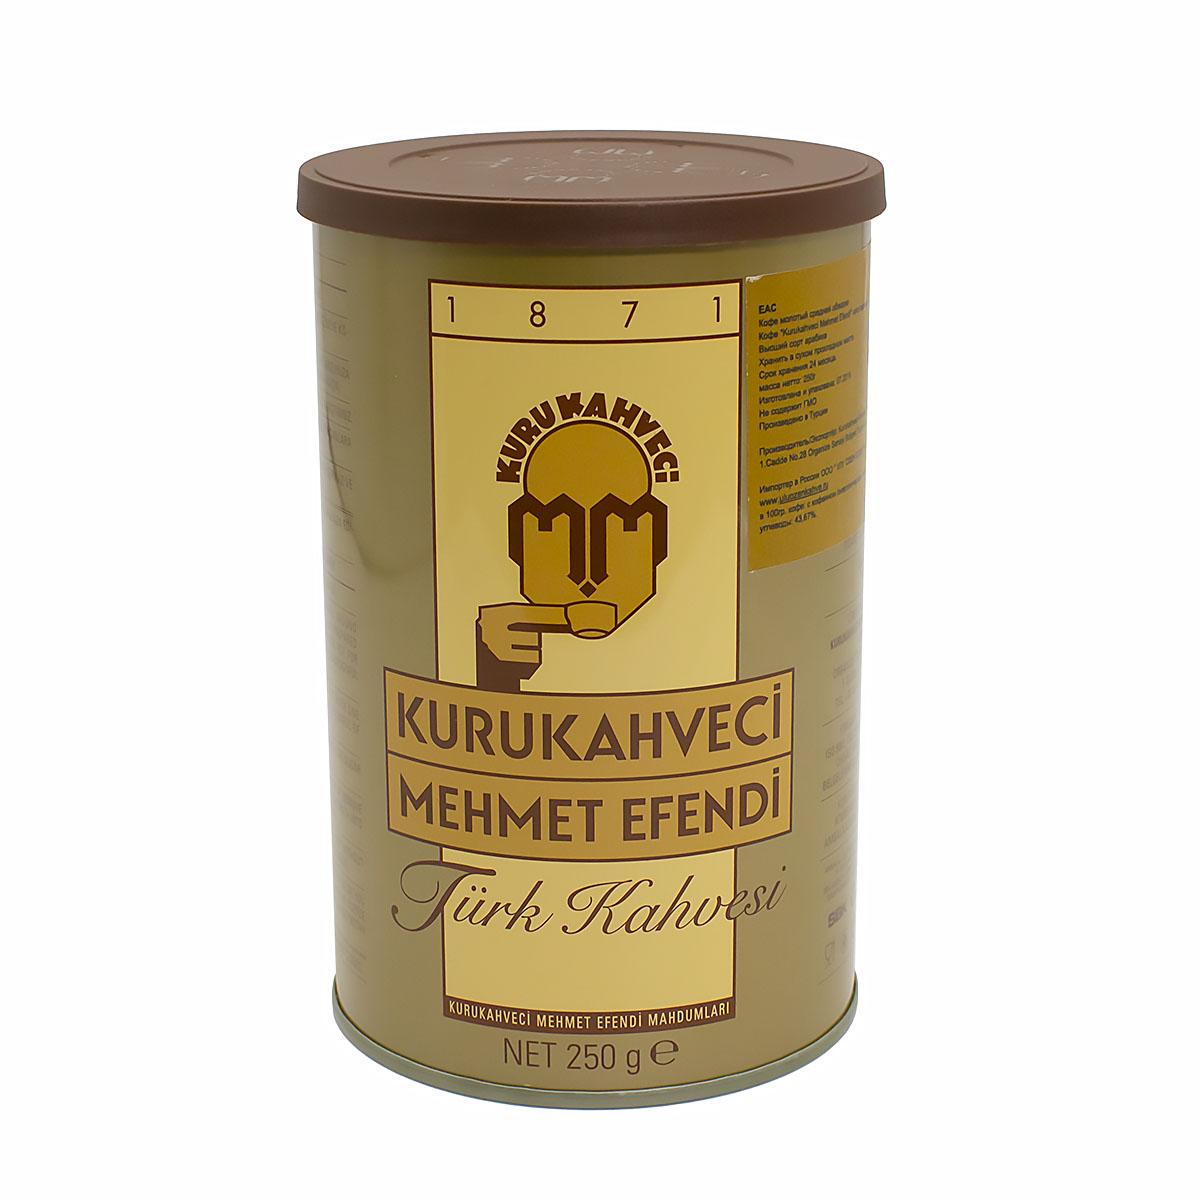 цена Кофе турецкий Mehmet Efendi молотый, 250 г онлайн в 2017 году